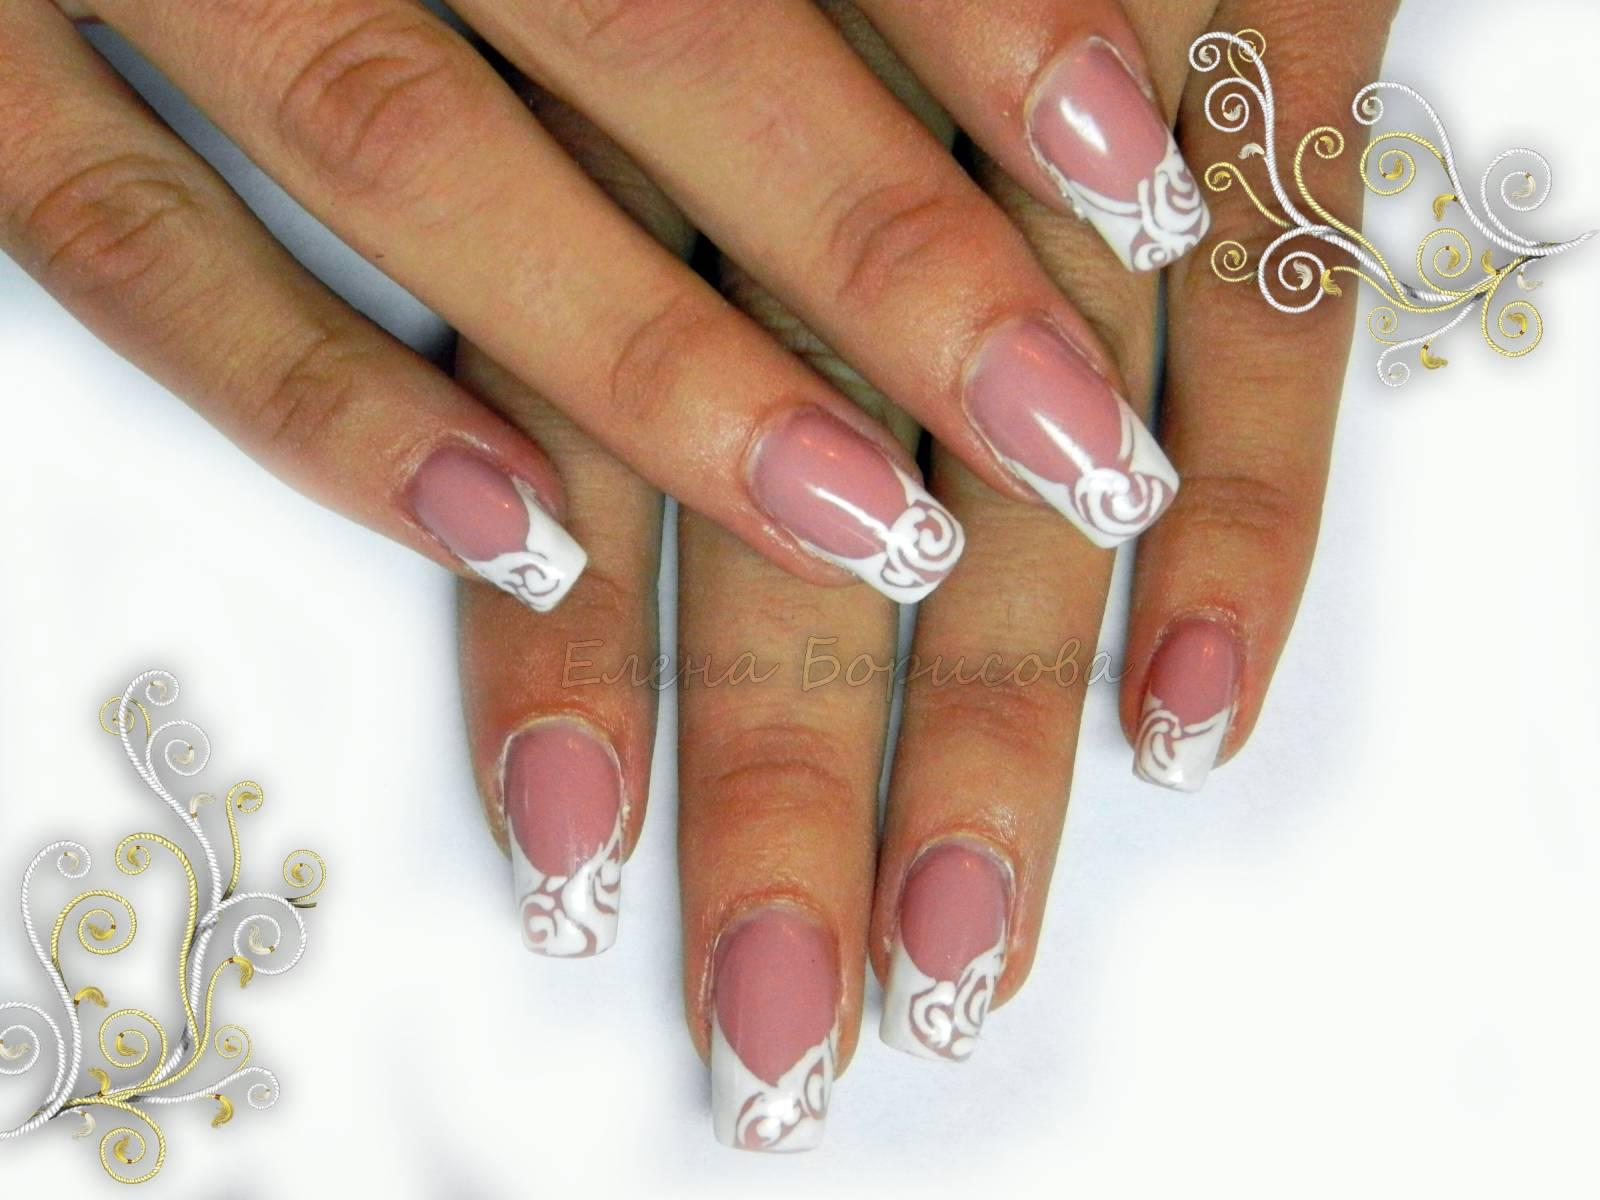 Ногти с белым френчем и рисунком на ней фото